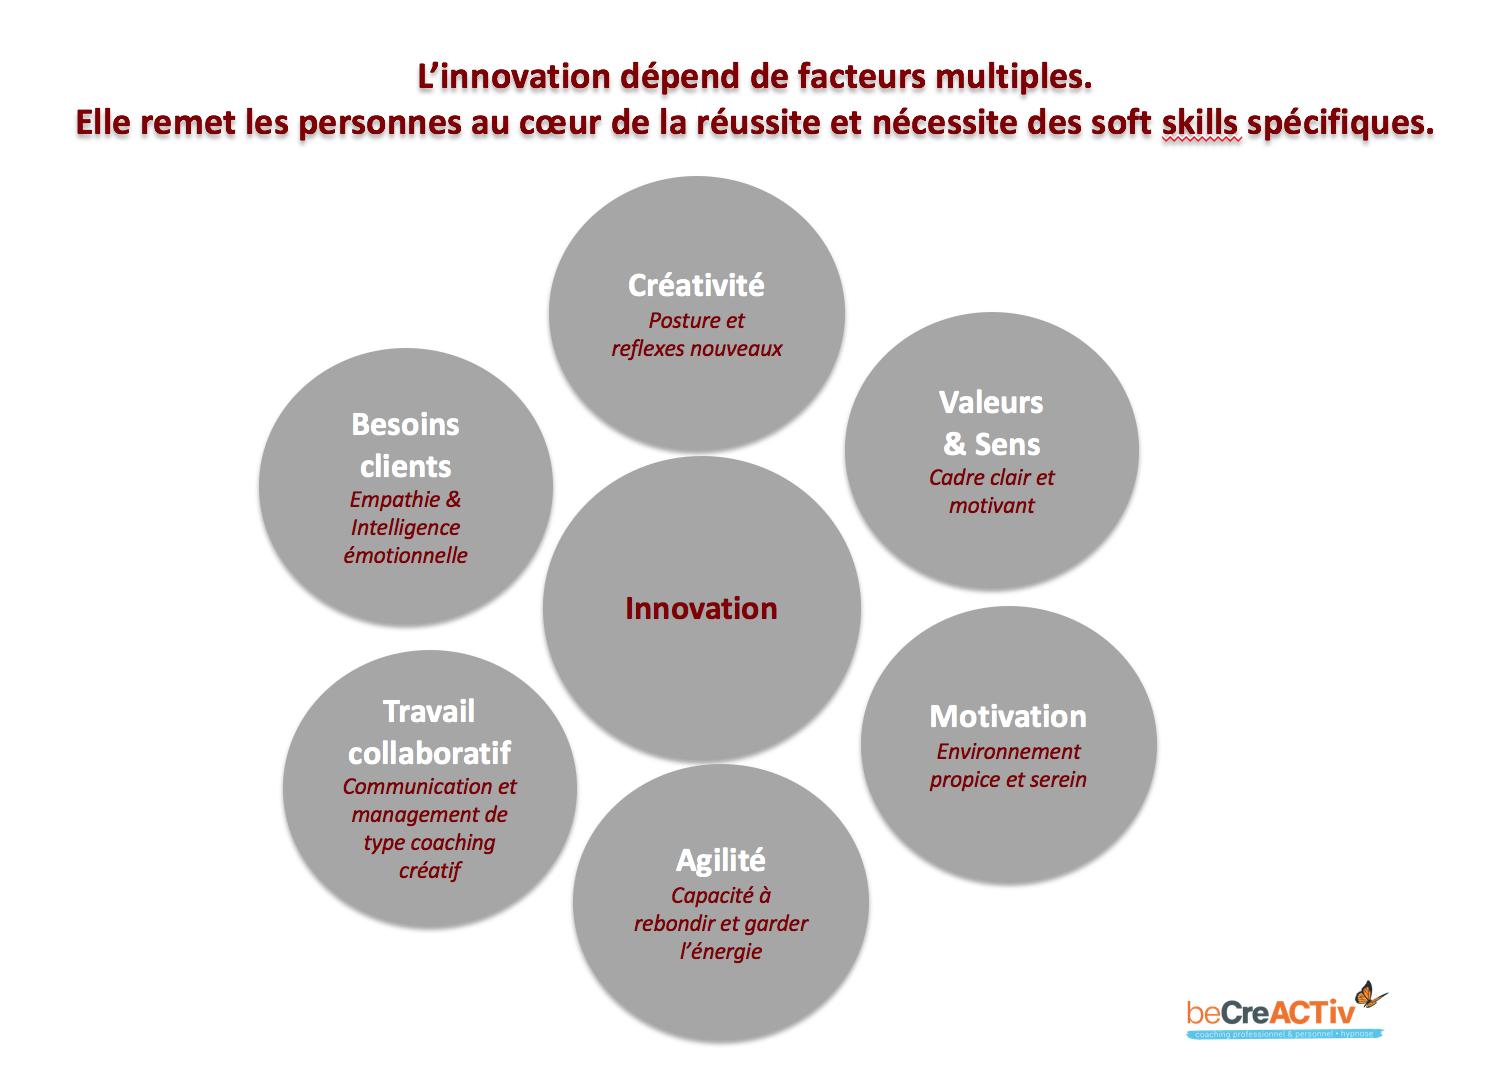 Innovation & facteurs clef